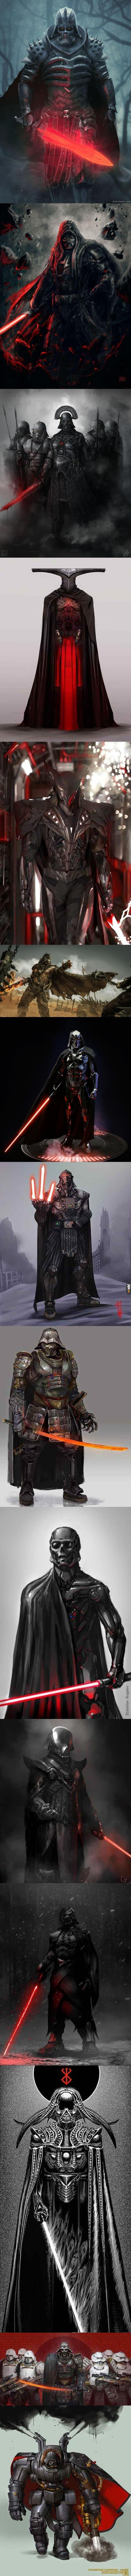 Vader w różnych wcieleniach